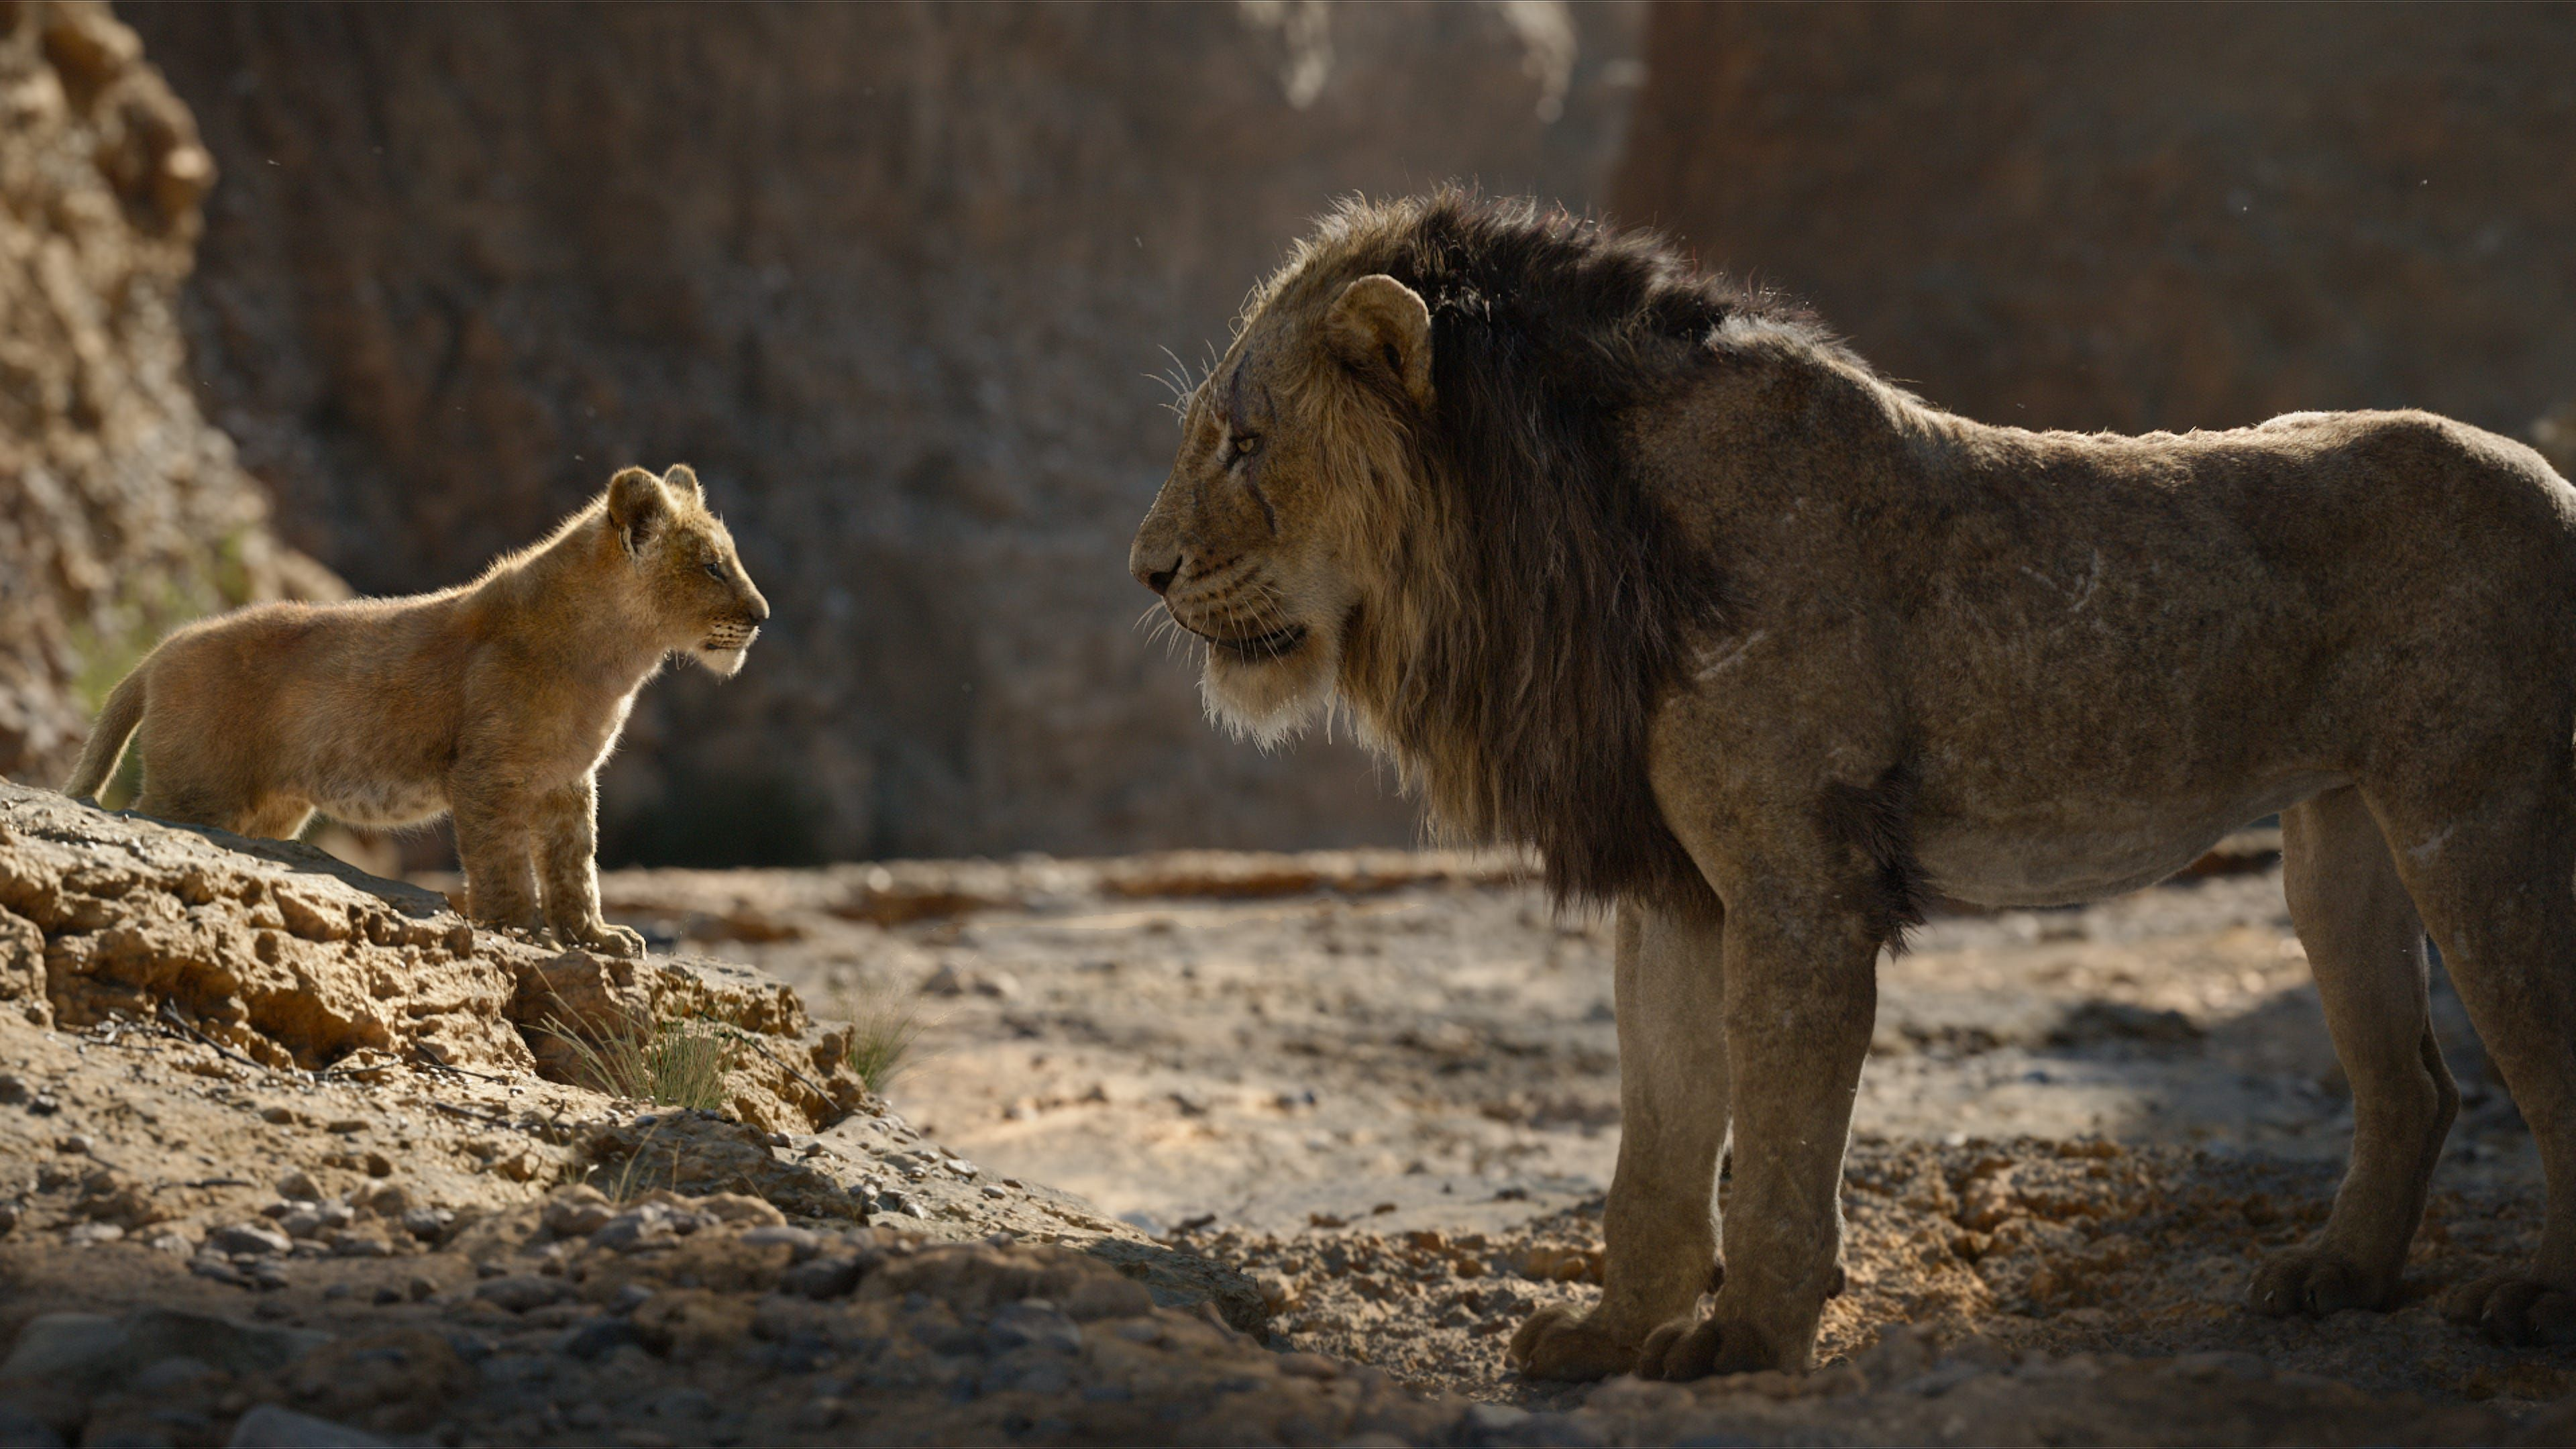 simba and scar 1565055682 - Simba And Scar - the lion king wallpapers, simba wallpapers, movies wallpapers, lion wallpapers, hd-wallpapers, disney wallpapers, 4k-wallpapers, 2019 movies wallpapers